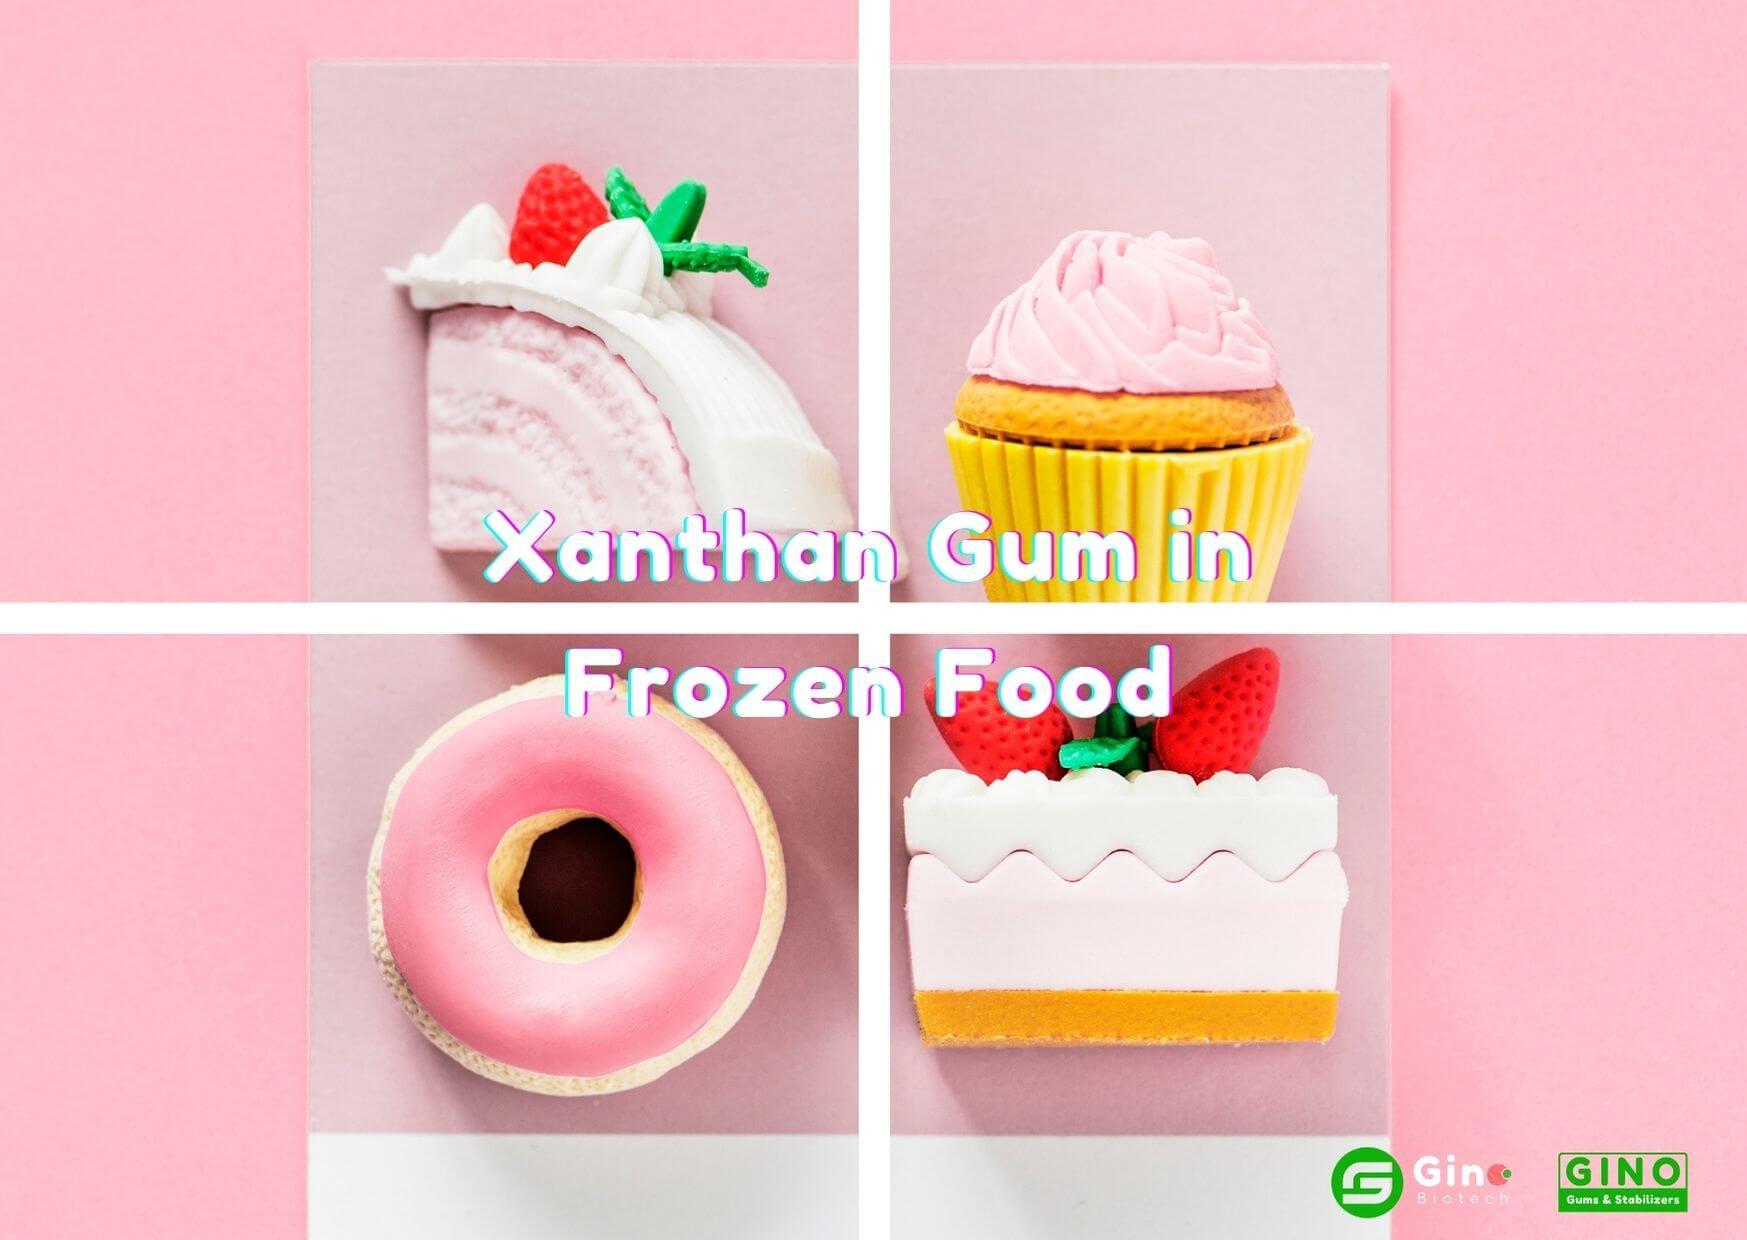 xanthan gum in ice cream